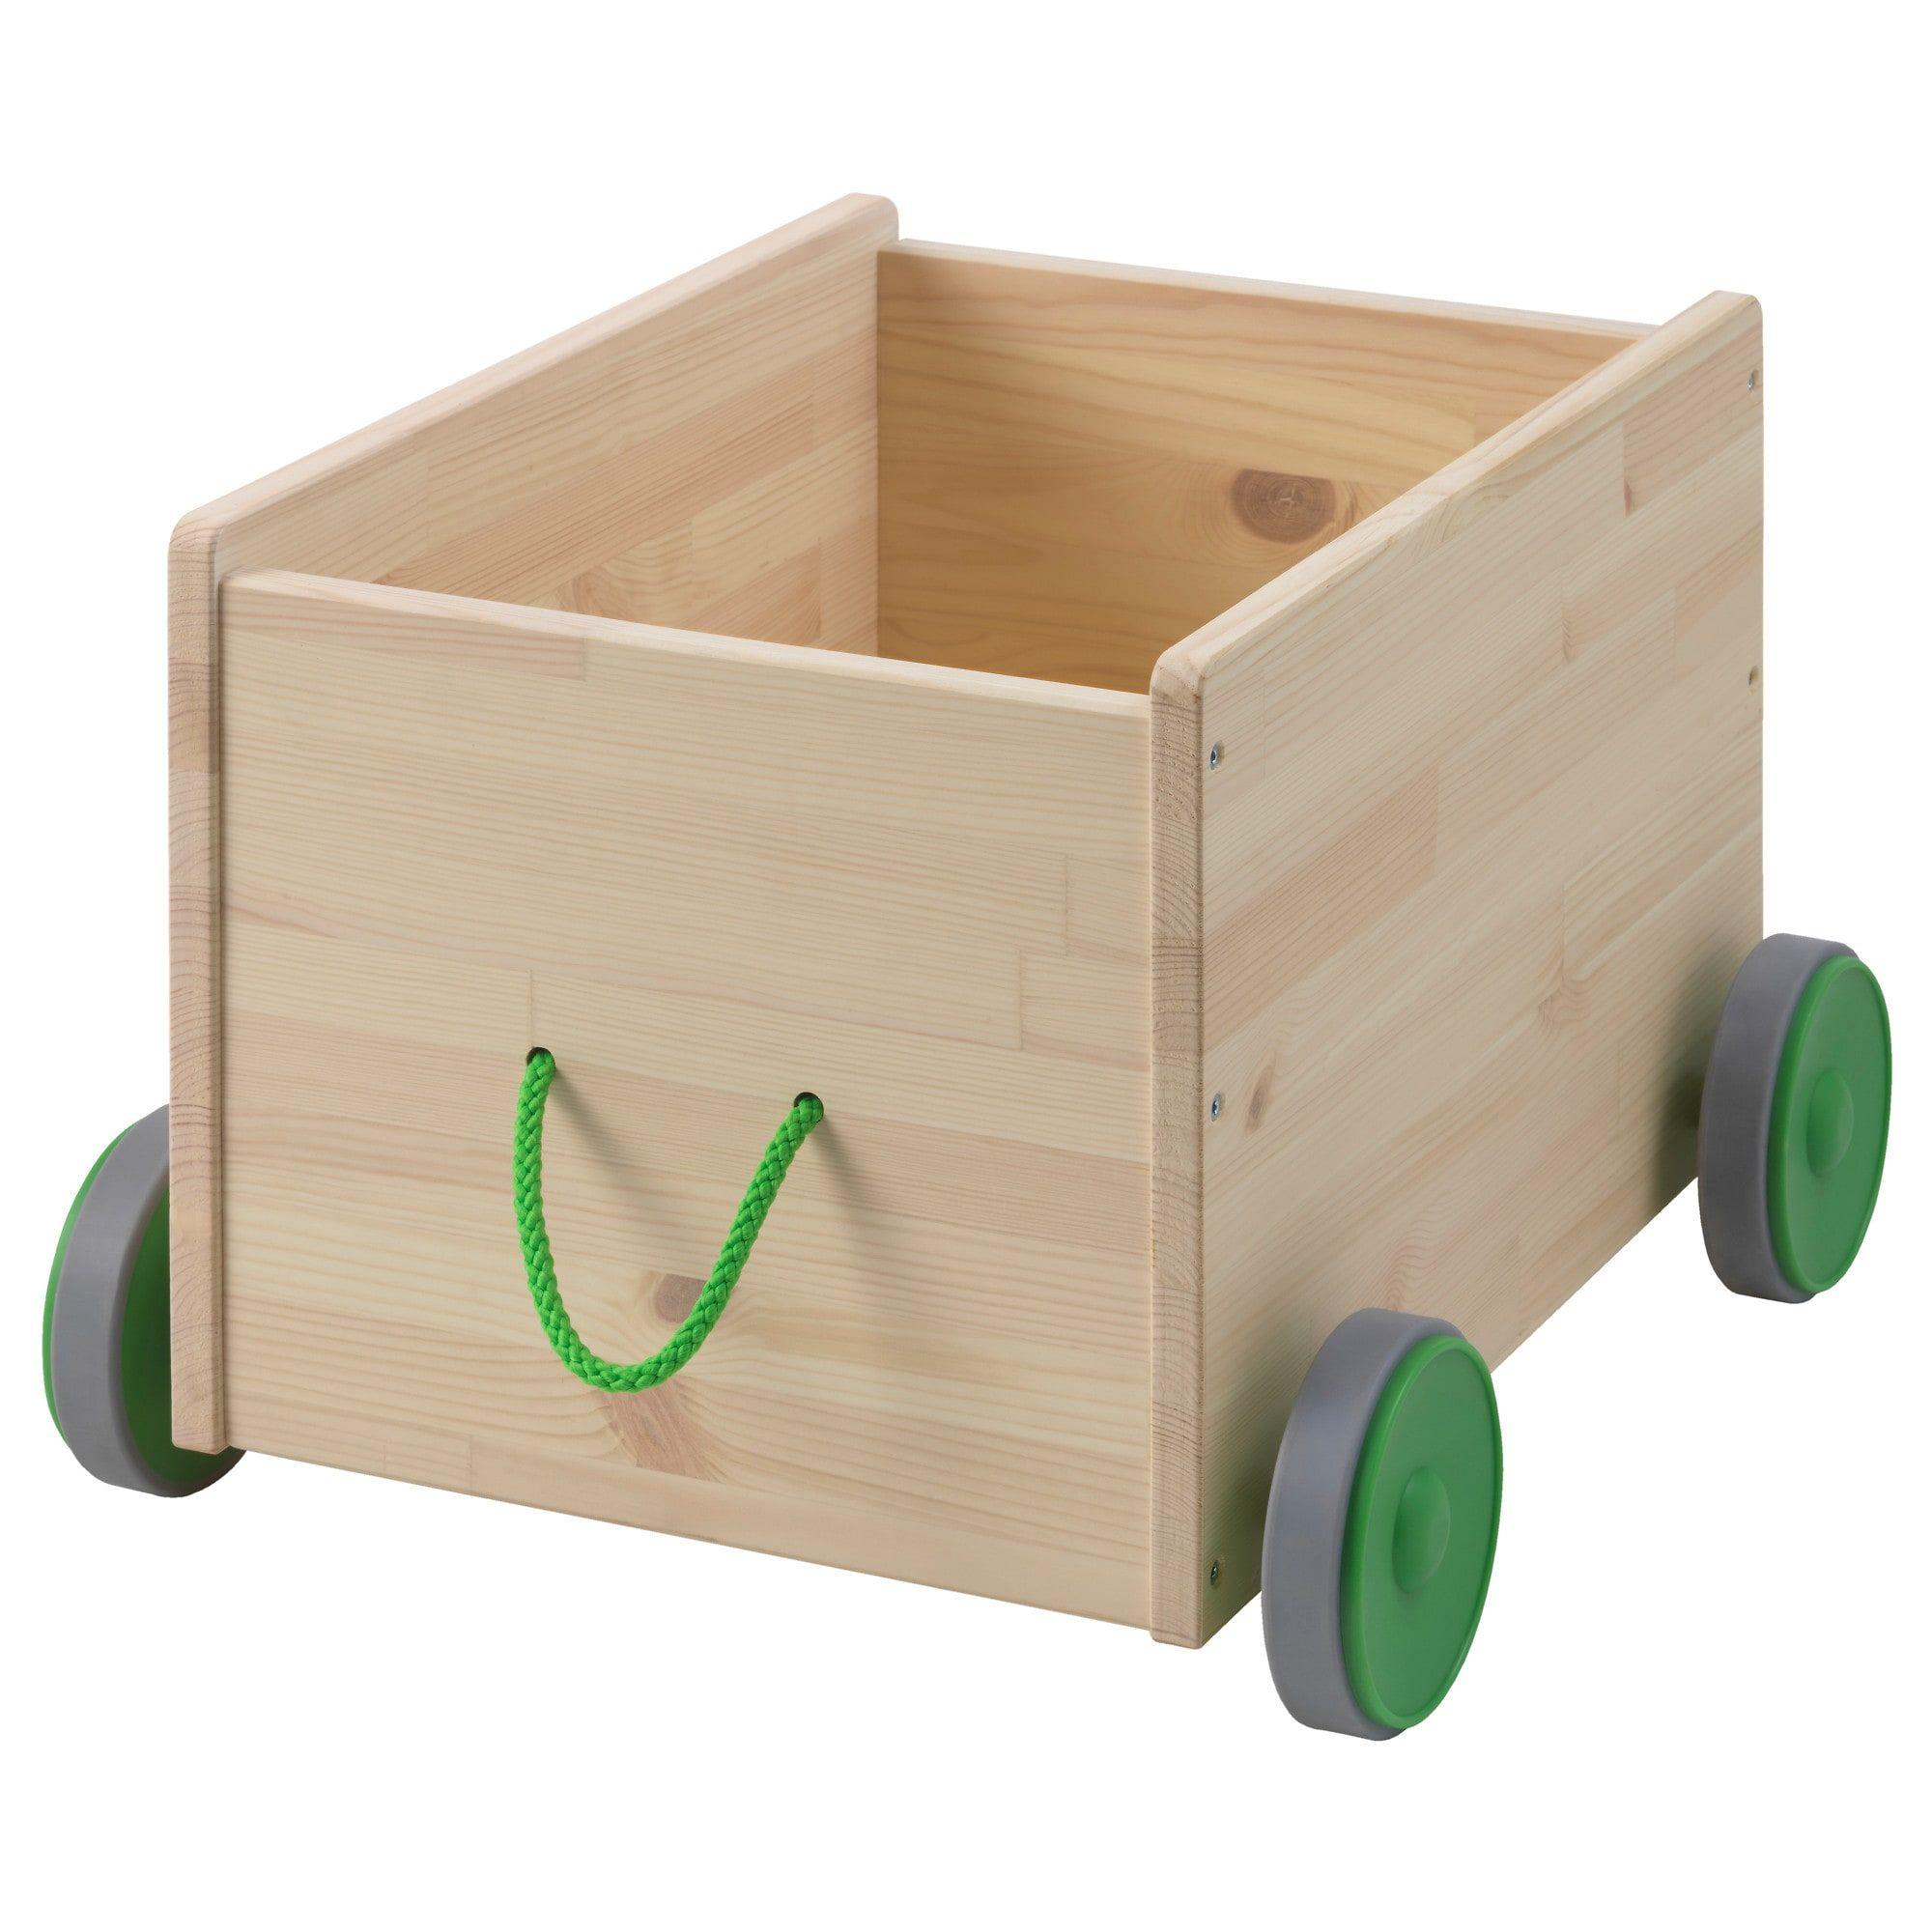 Flisat Toy Storage With Casters Organizador De Juguetes Almacenamiento De Juguetes Ikea Cajas De Juguetes